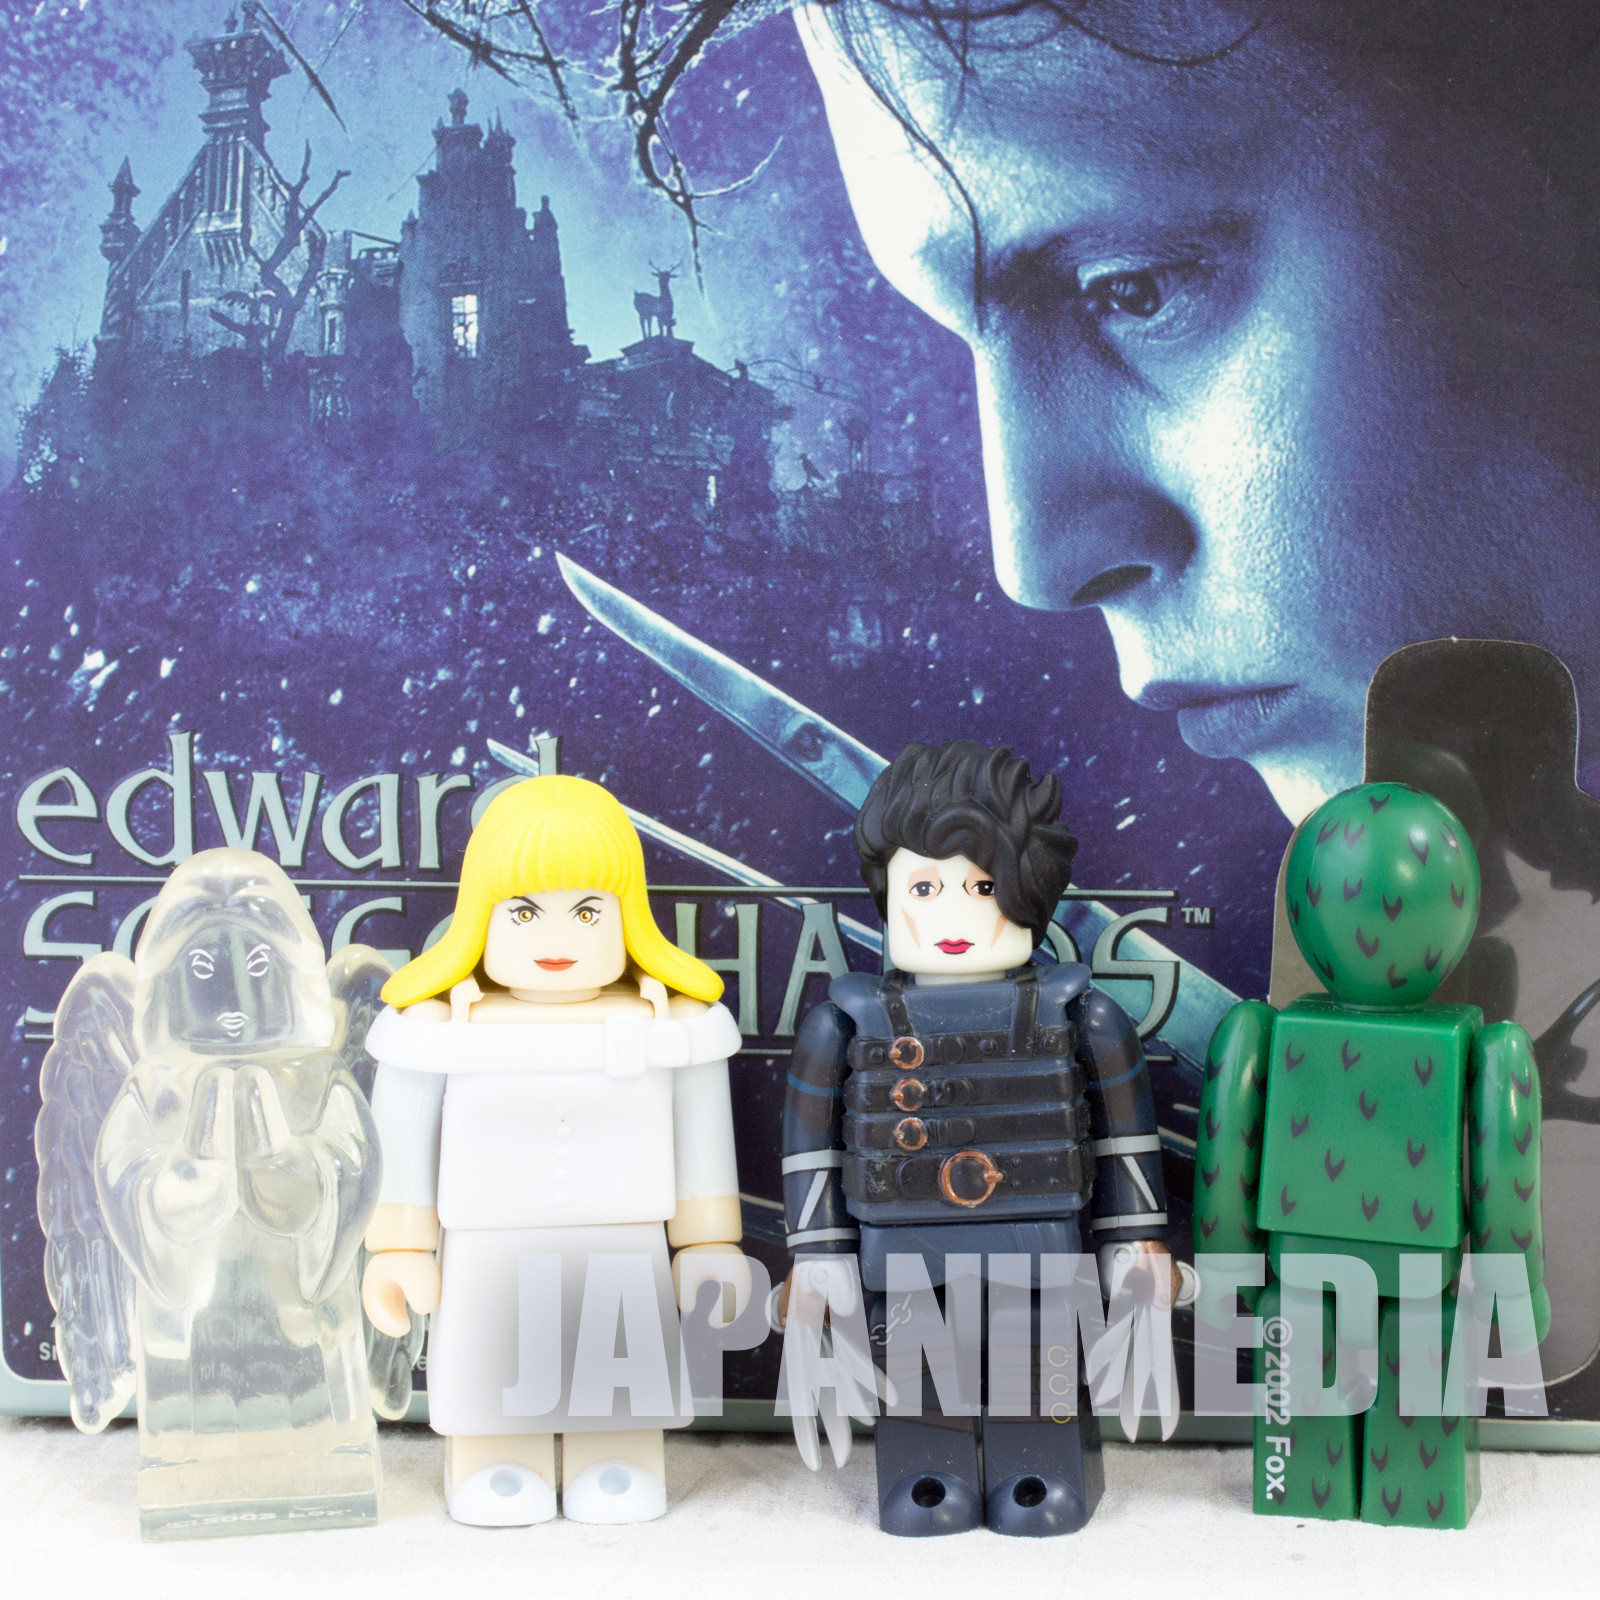 Edward Scissorhands Kim Kubrick figure 4 set Medicom Toy JAPAN Johnny Depp